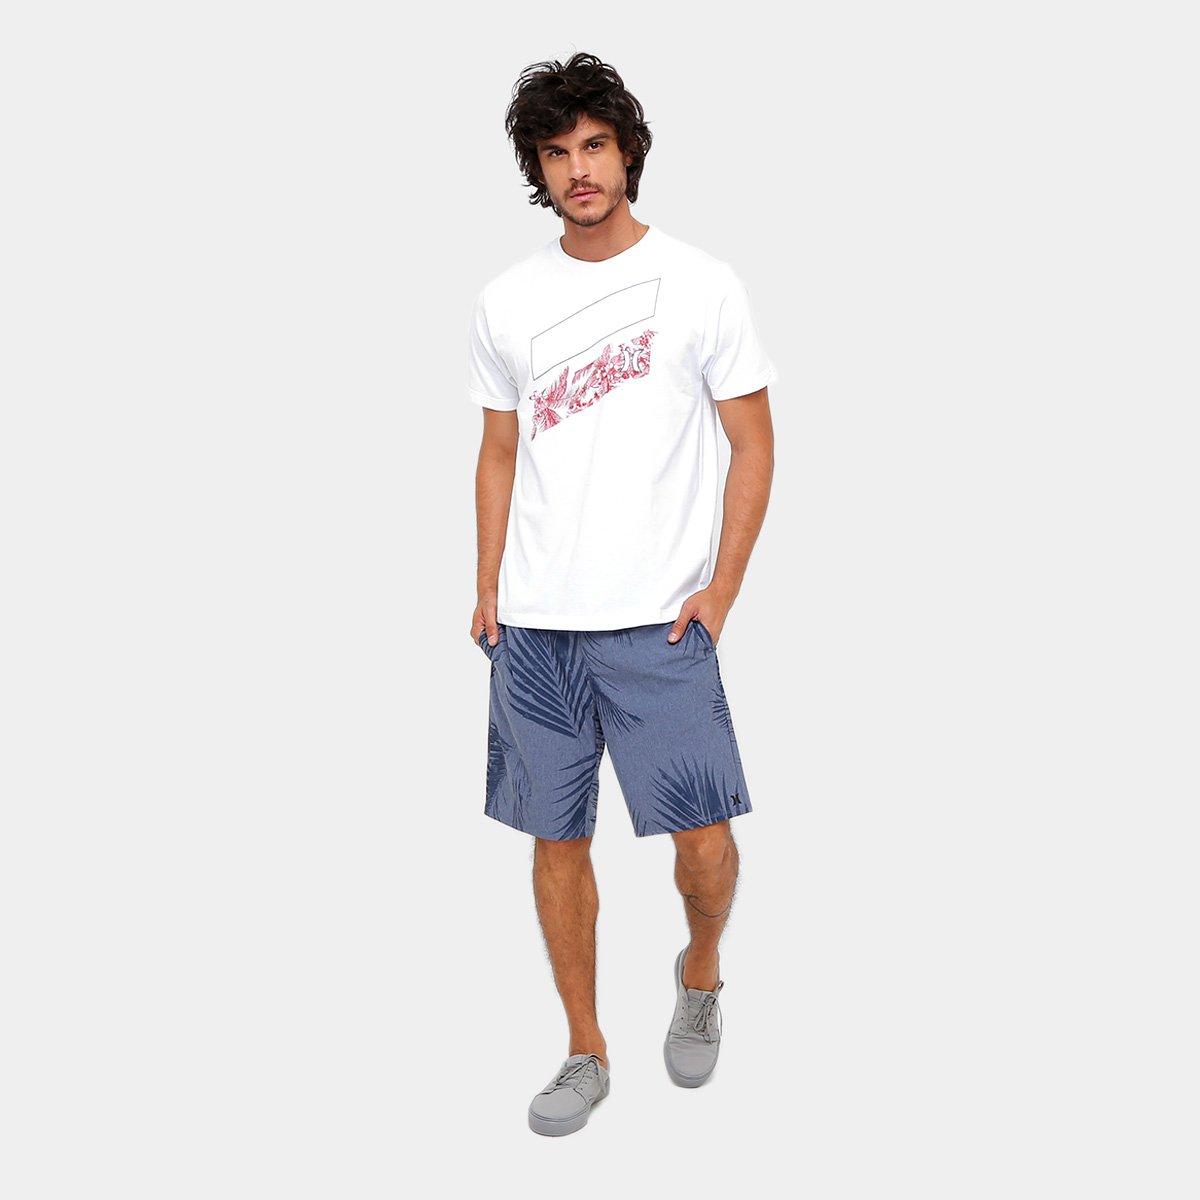 Camiseta Hurley Silk Icon Slash Hilo Masculina - Compre Agora  beffb1b3f08